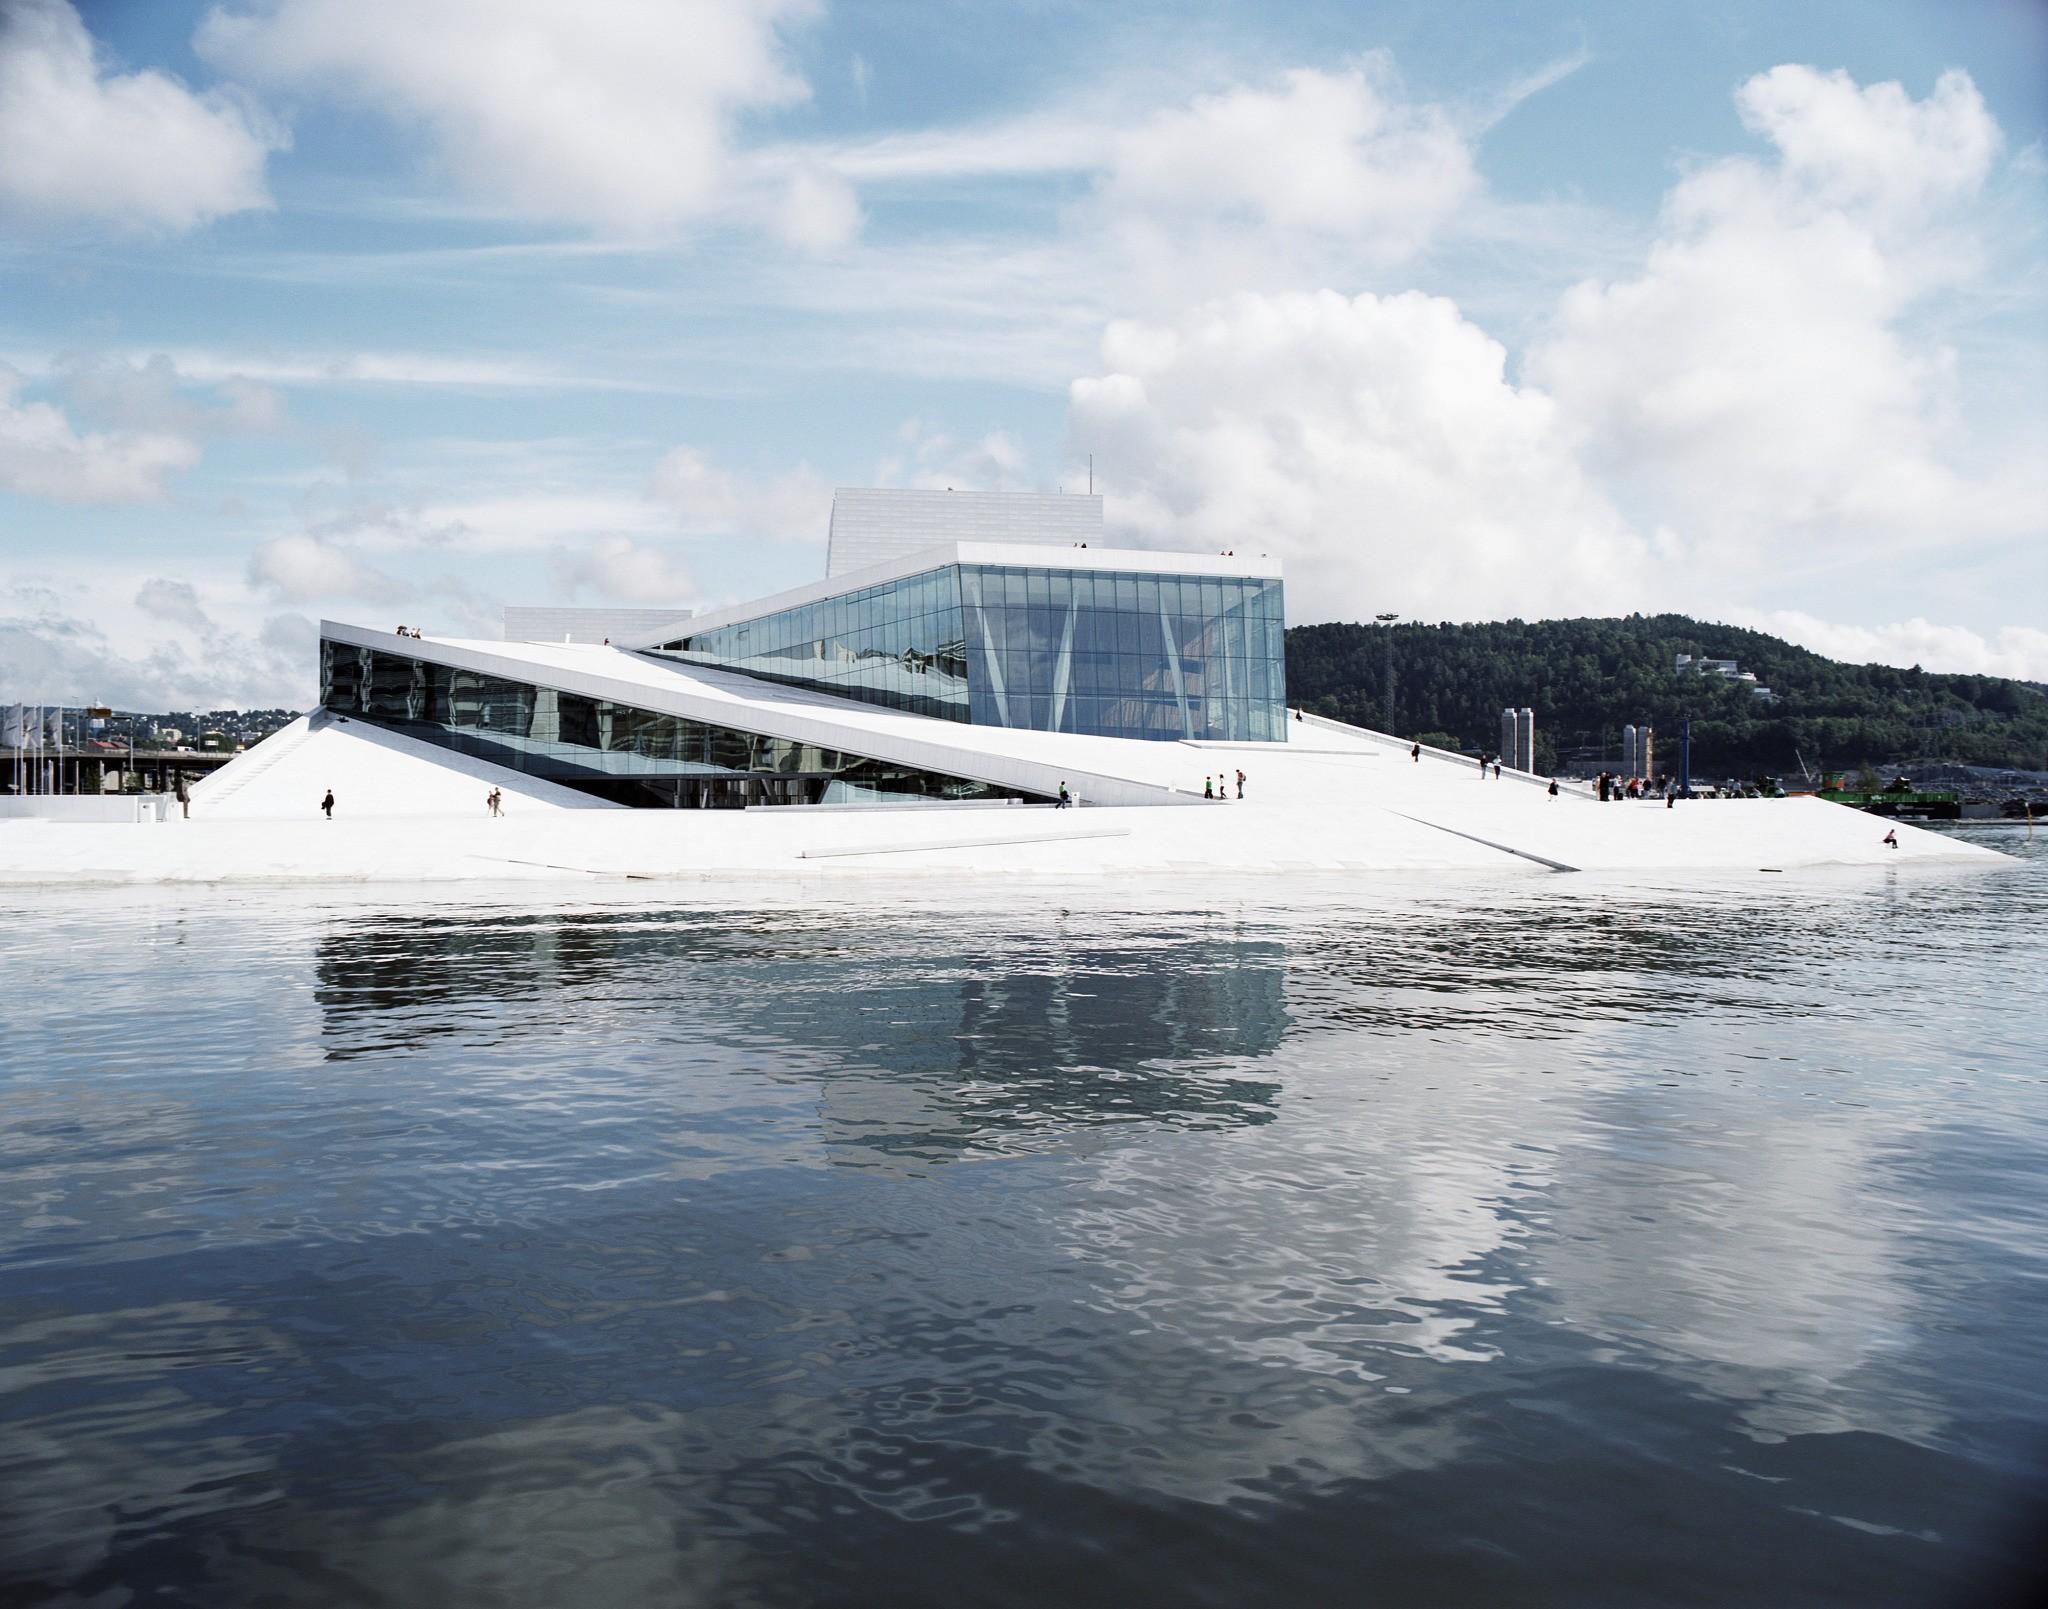 The Olso Opera House